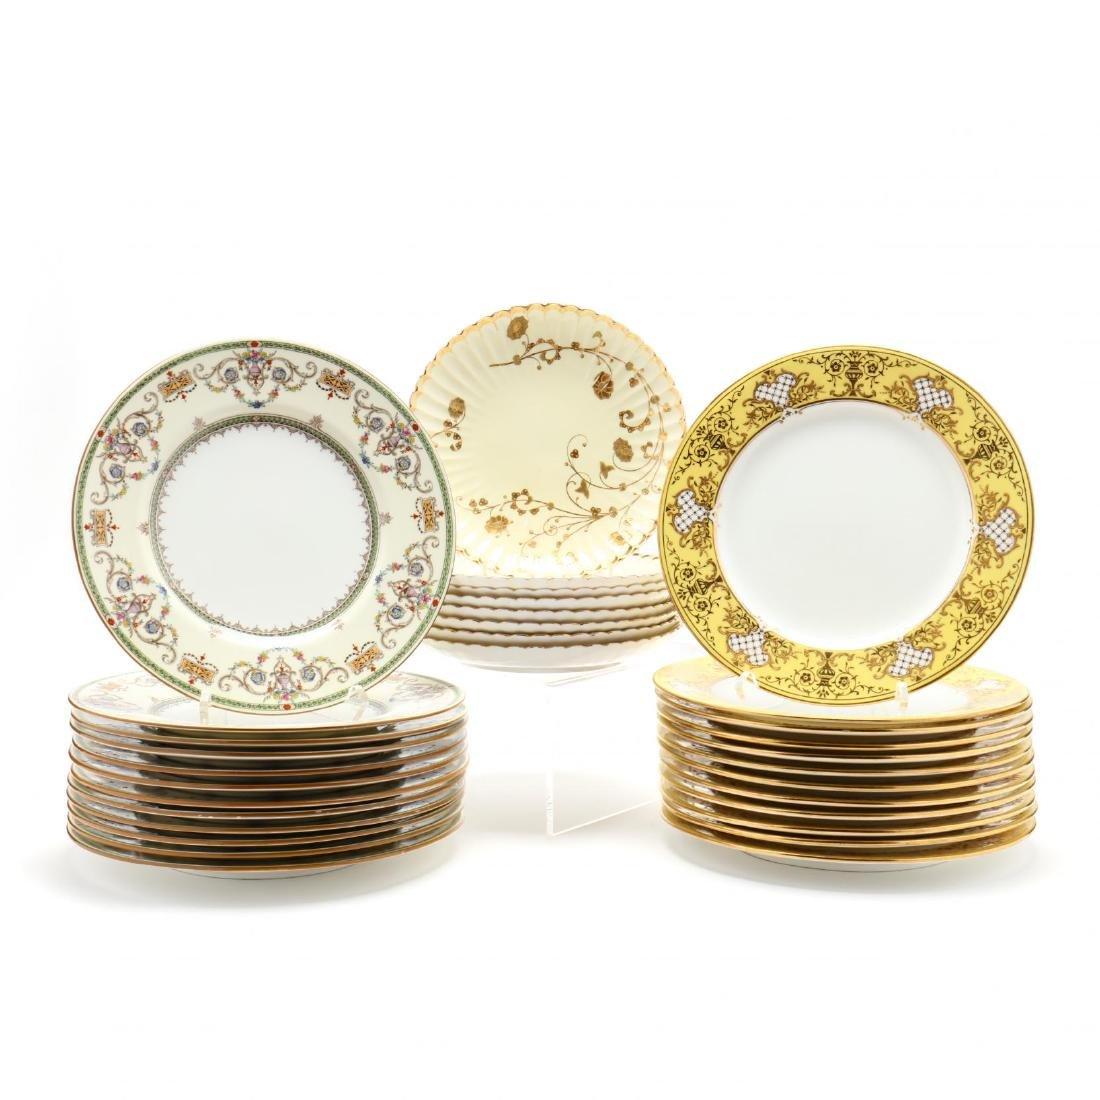 Three Sets of English Plates